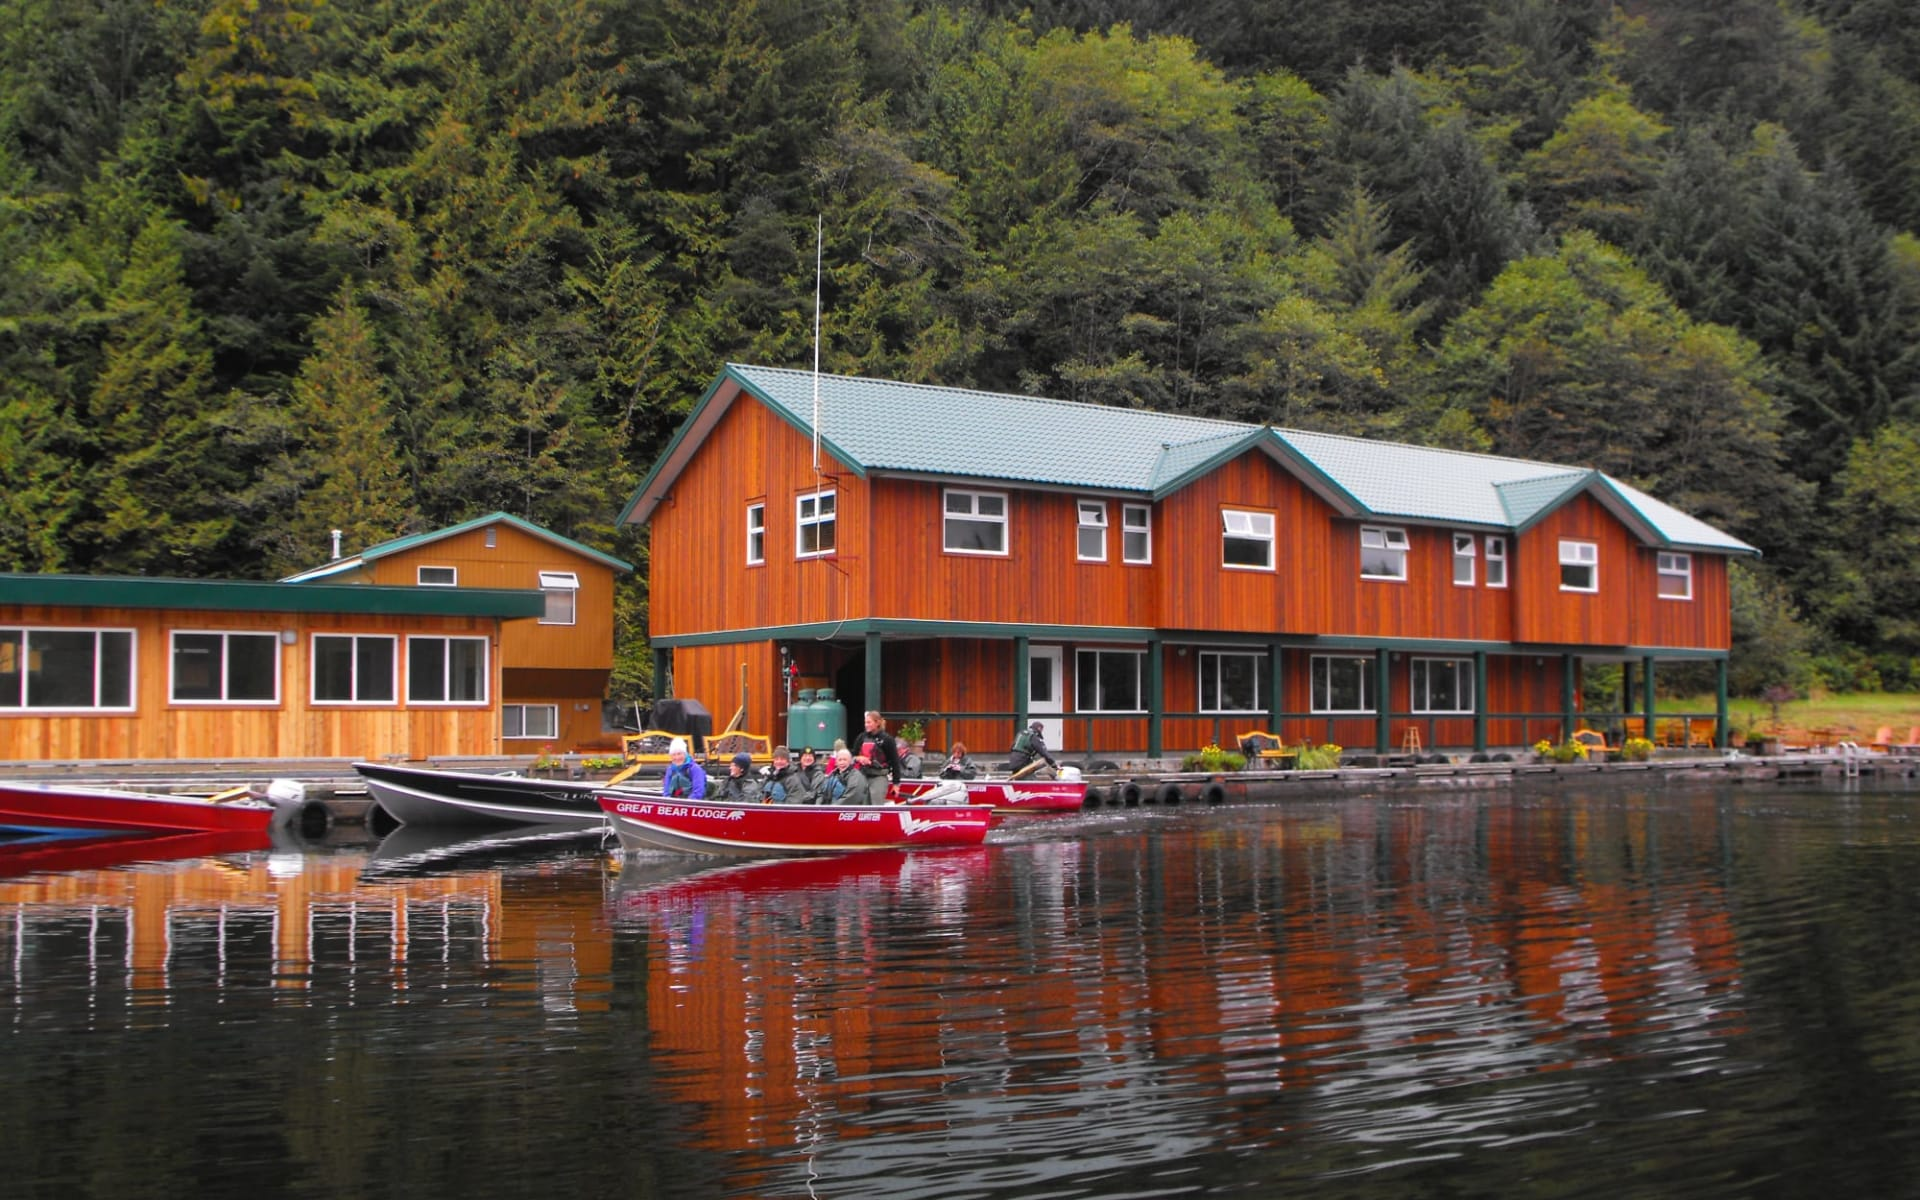 Bärenbeobachtung Great Bear Lodge 4 Tage ab Port Hardy: exterior: Great Bear Lodge - Lodge von aussen